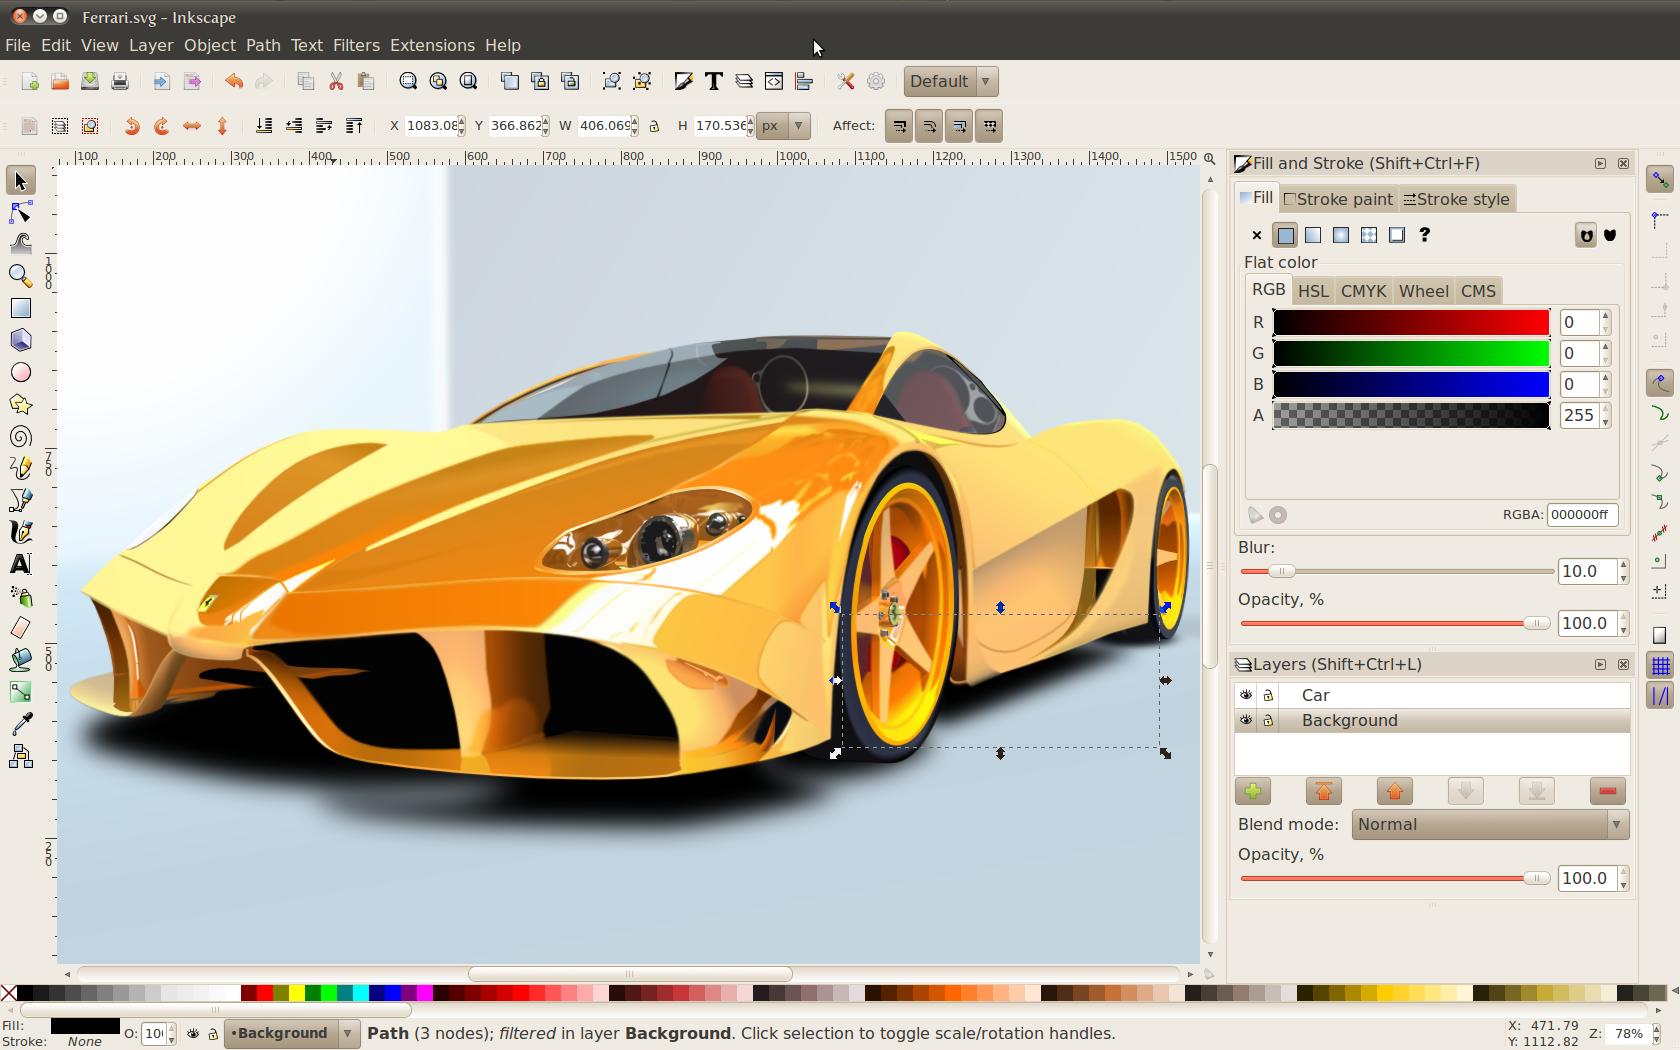 Pro Illustrator Vector drawing imaging Software suite Windows 10 8 7 INKSCAPE